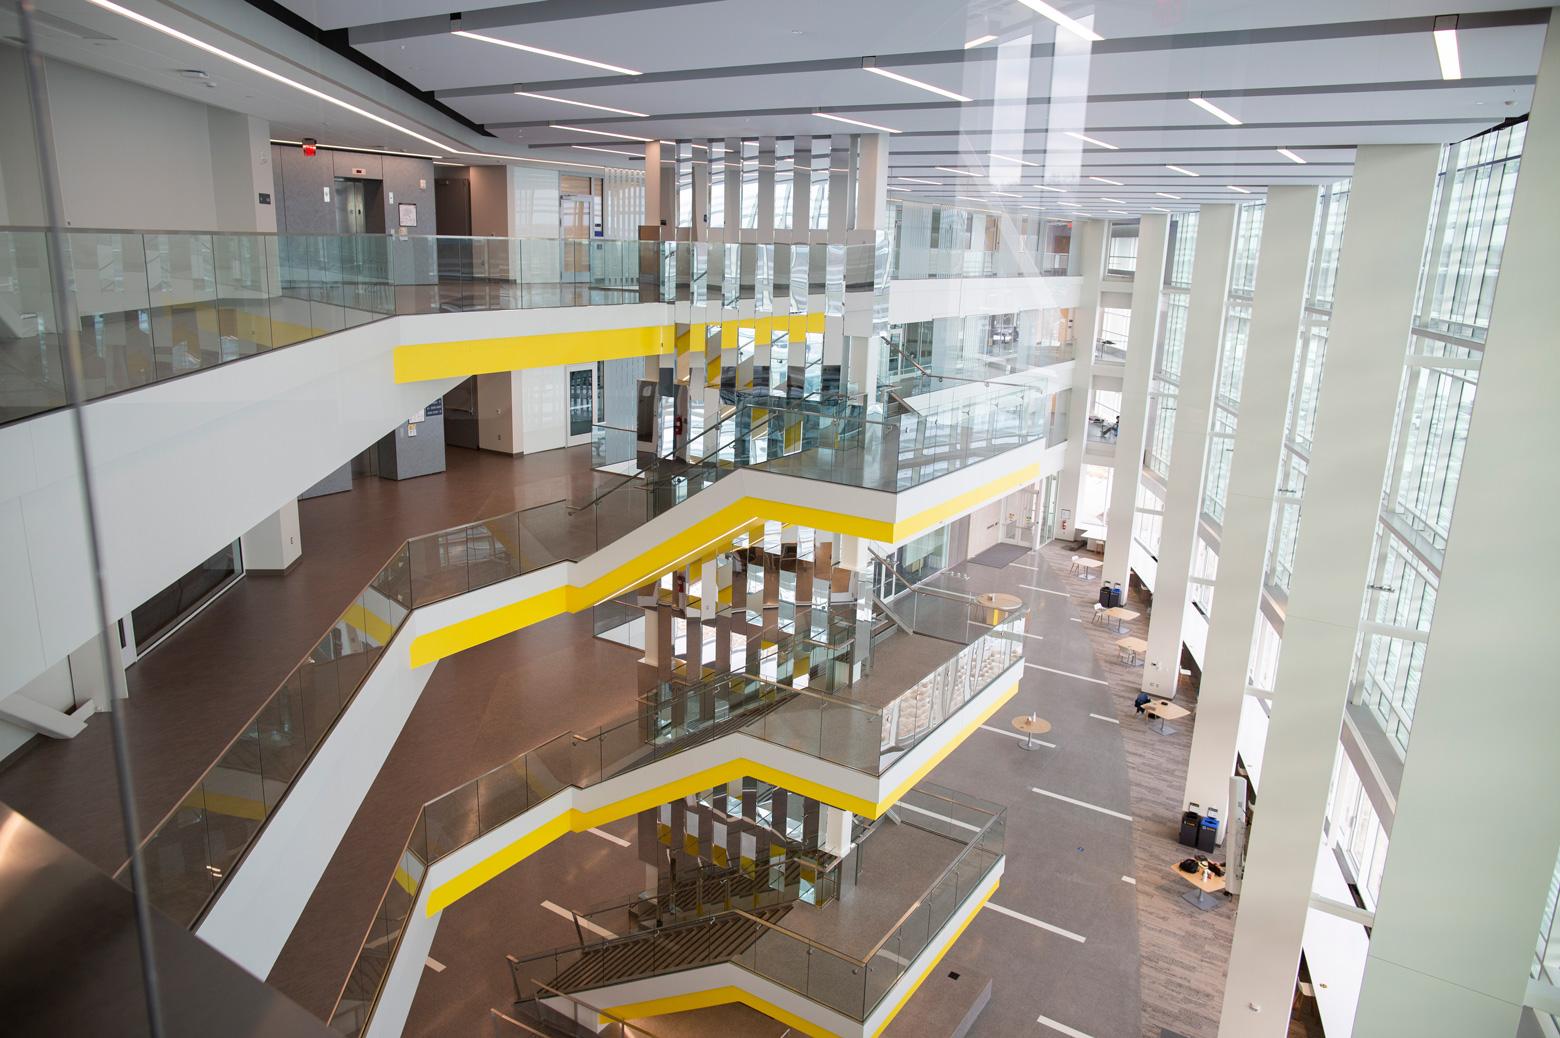 The atrium of the Ford Robotics Building at the University of Michigan.